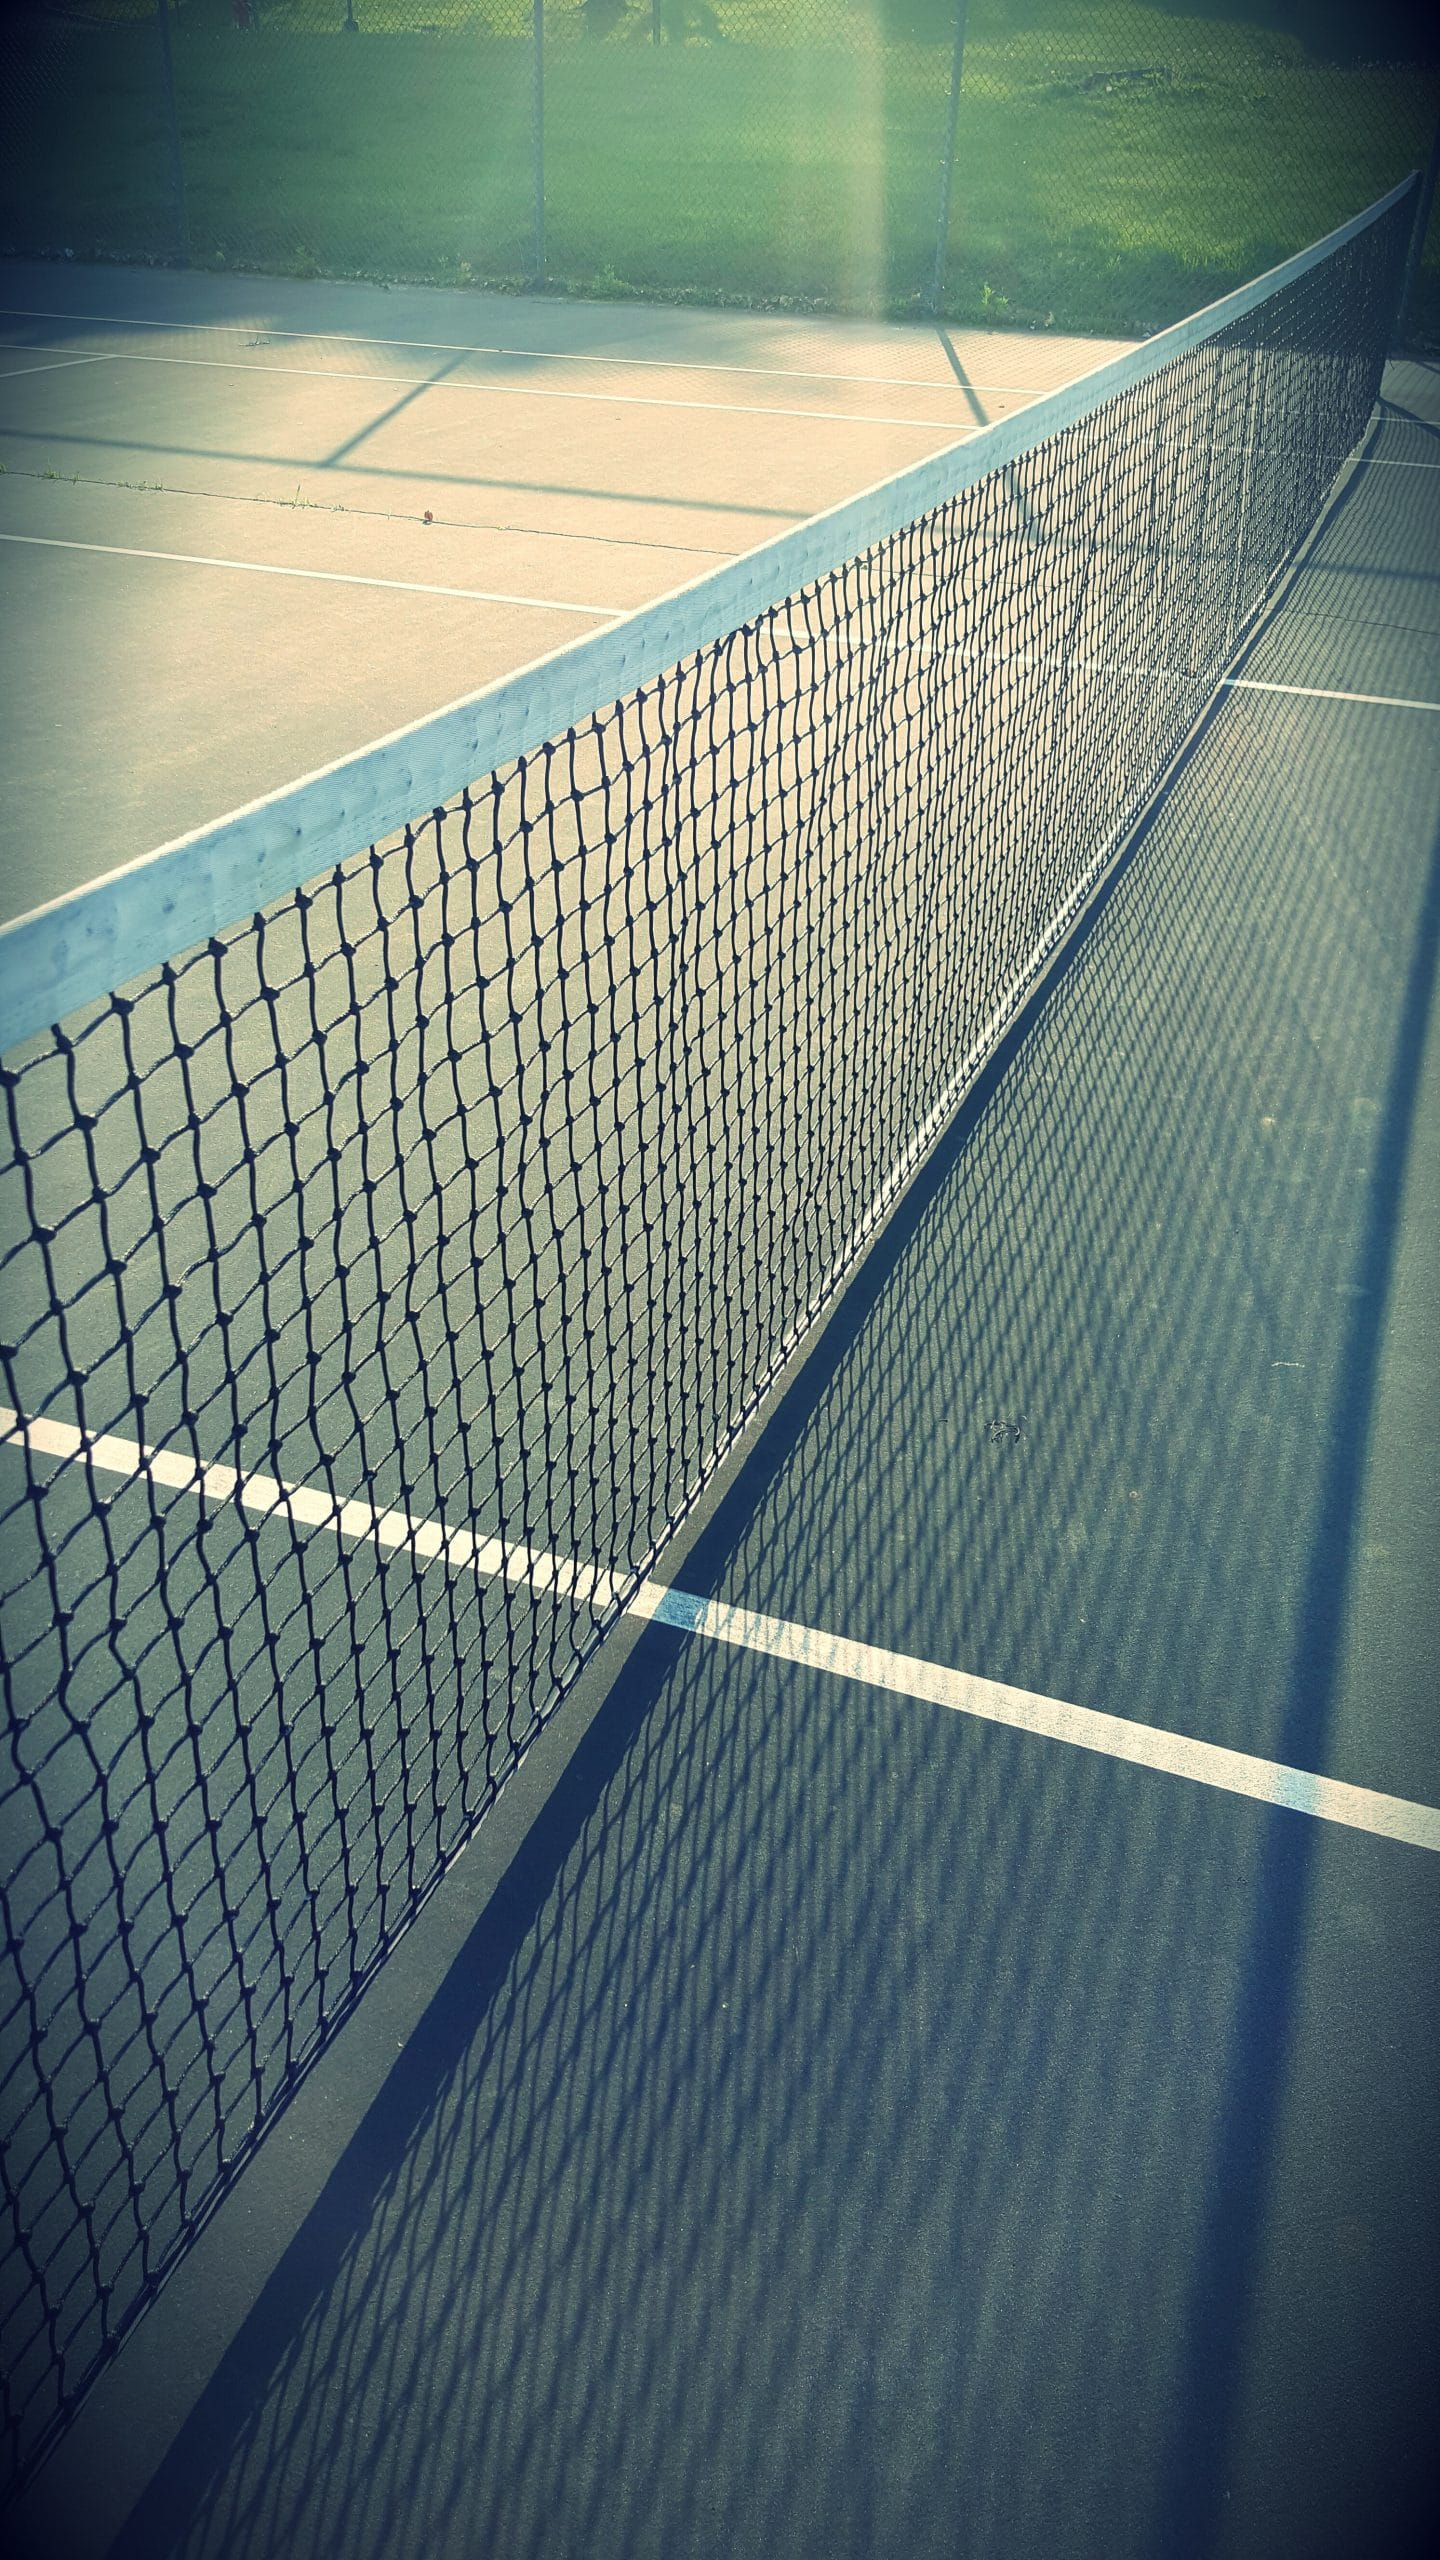 Wimbledon Staff – Life Behind the Scenes